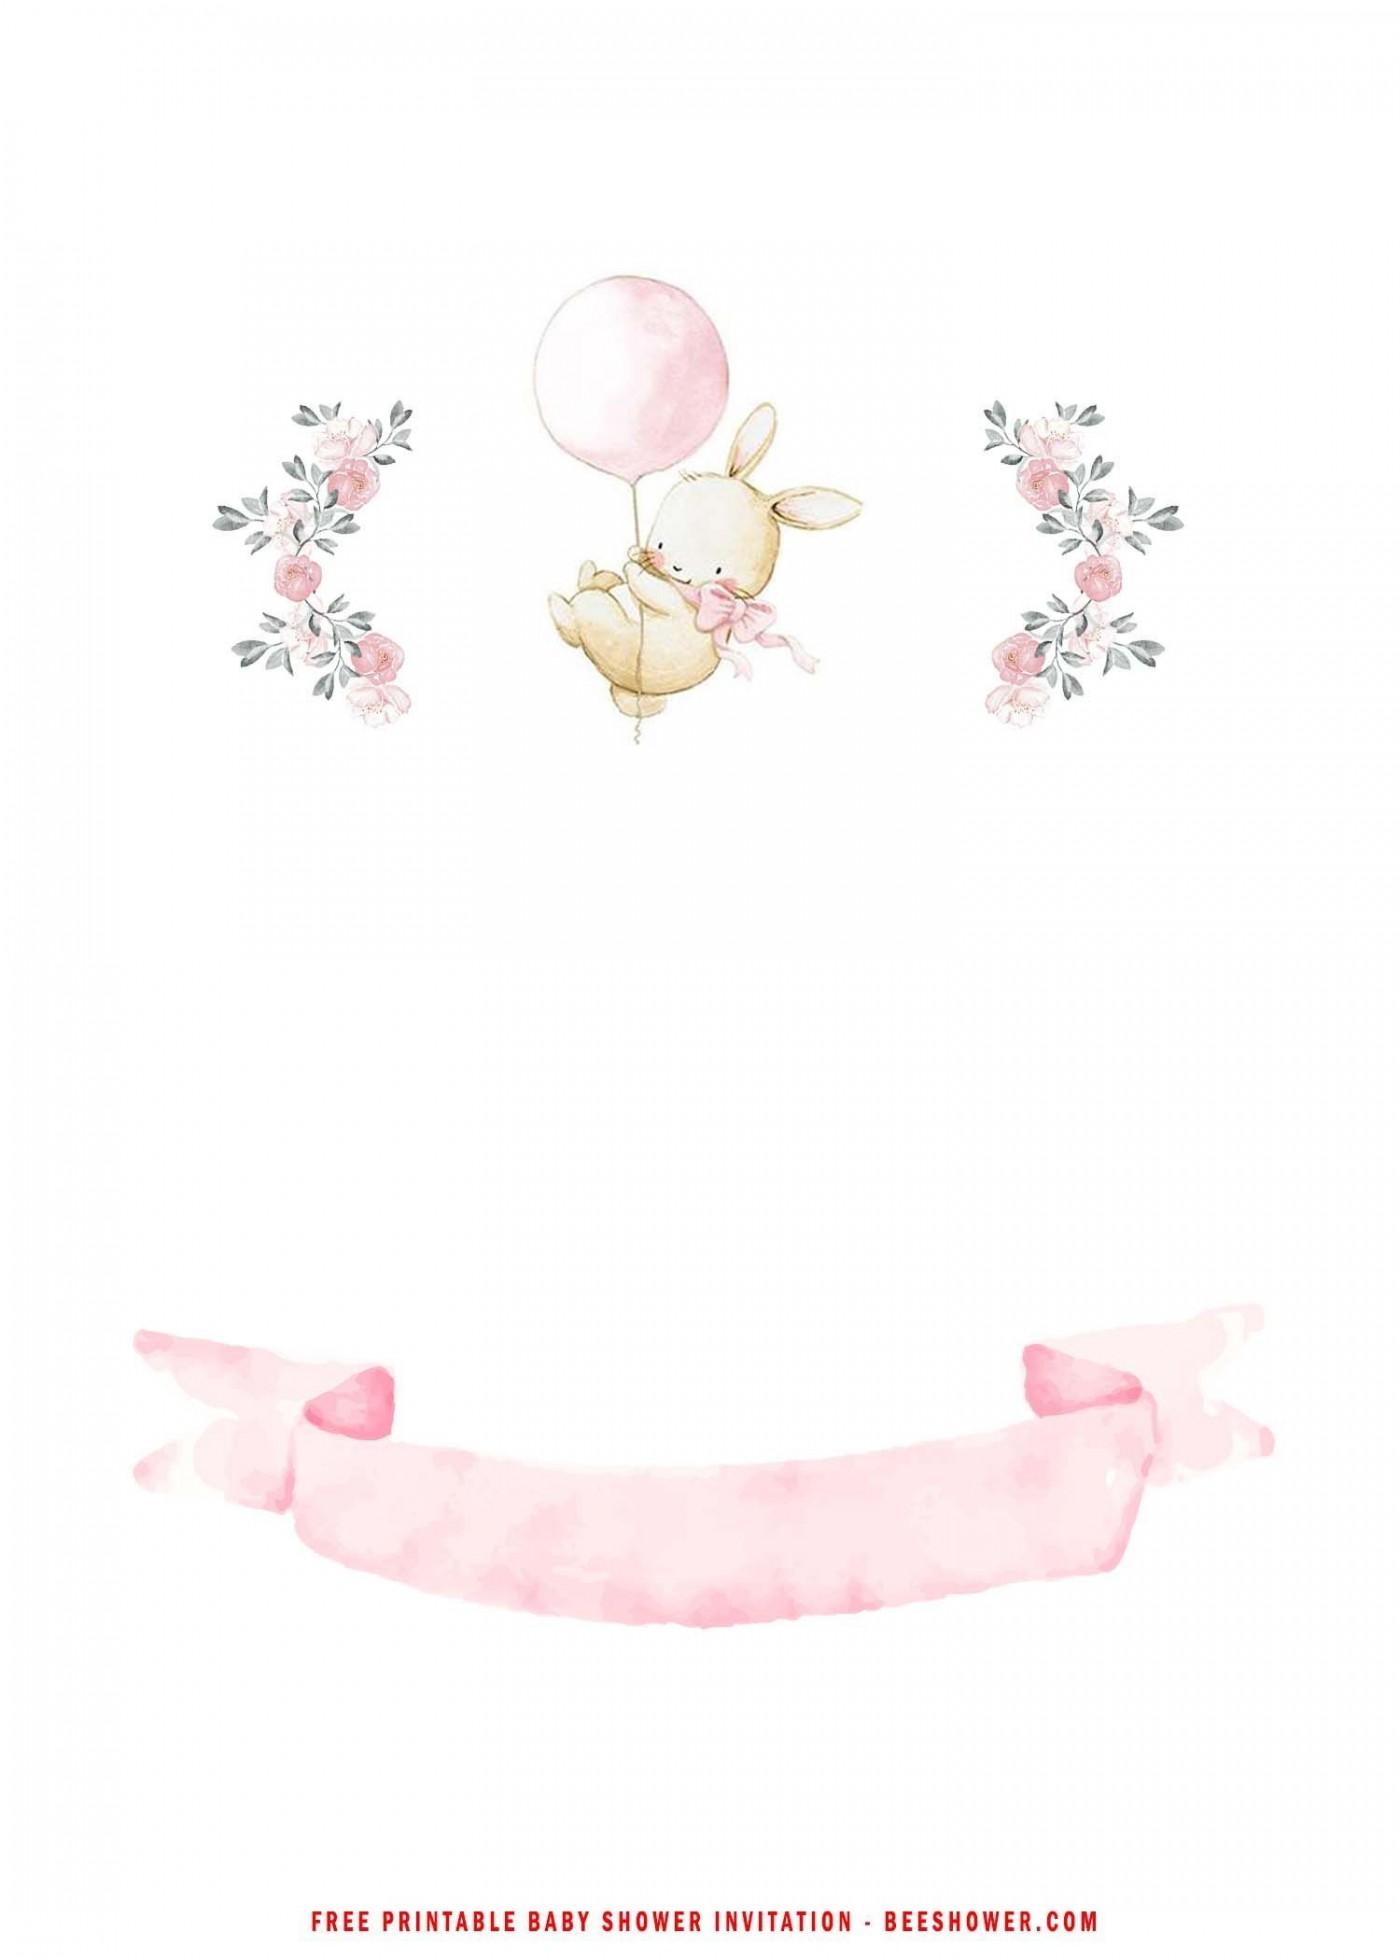 005 Beautiful Baby Shower Invitation Girl Free Printable Idea  Twin1400